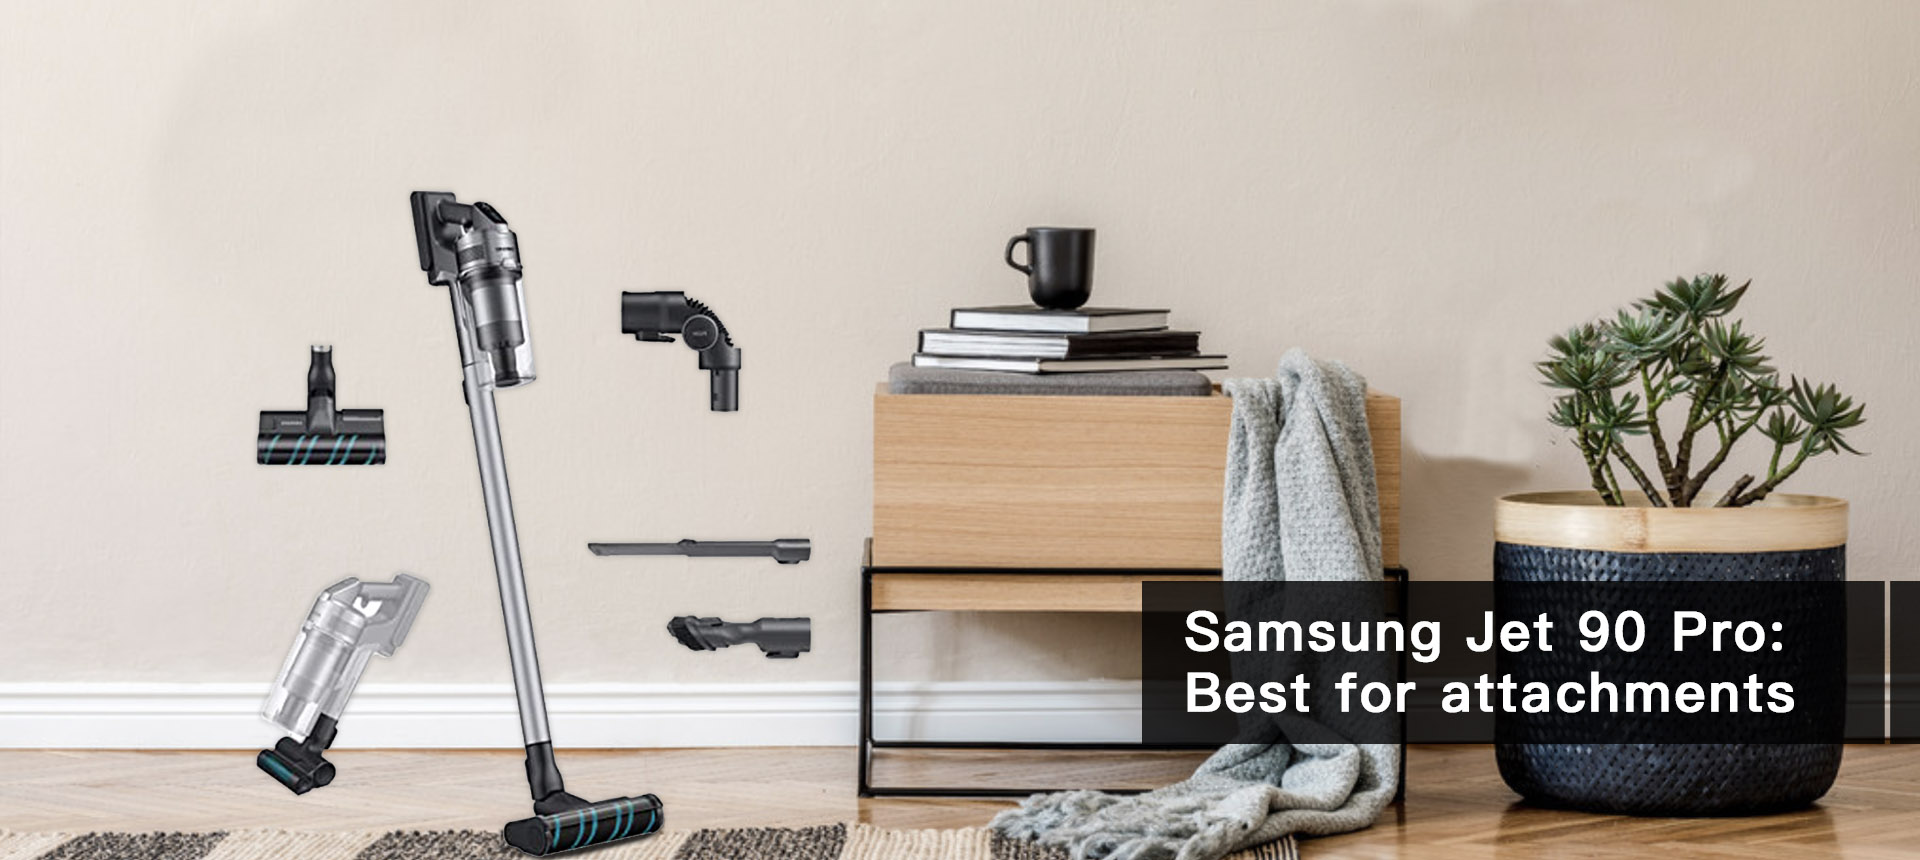 Samsung Jet 90 Pro VS20R9049S3 Cordless Vacuum Cleaner